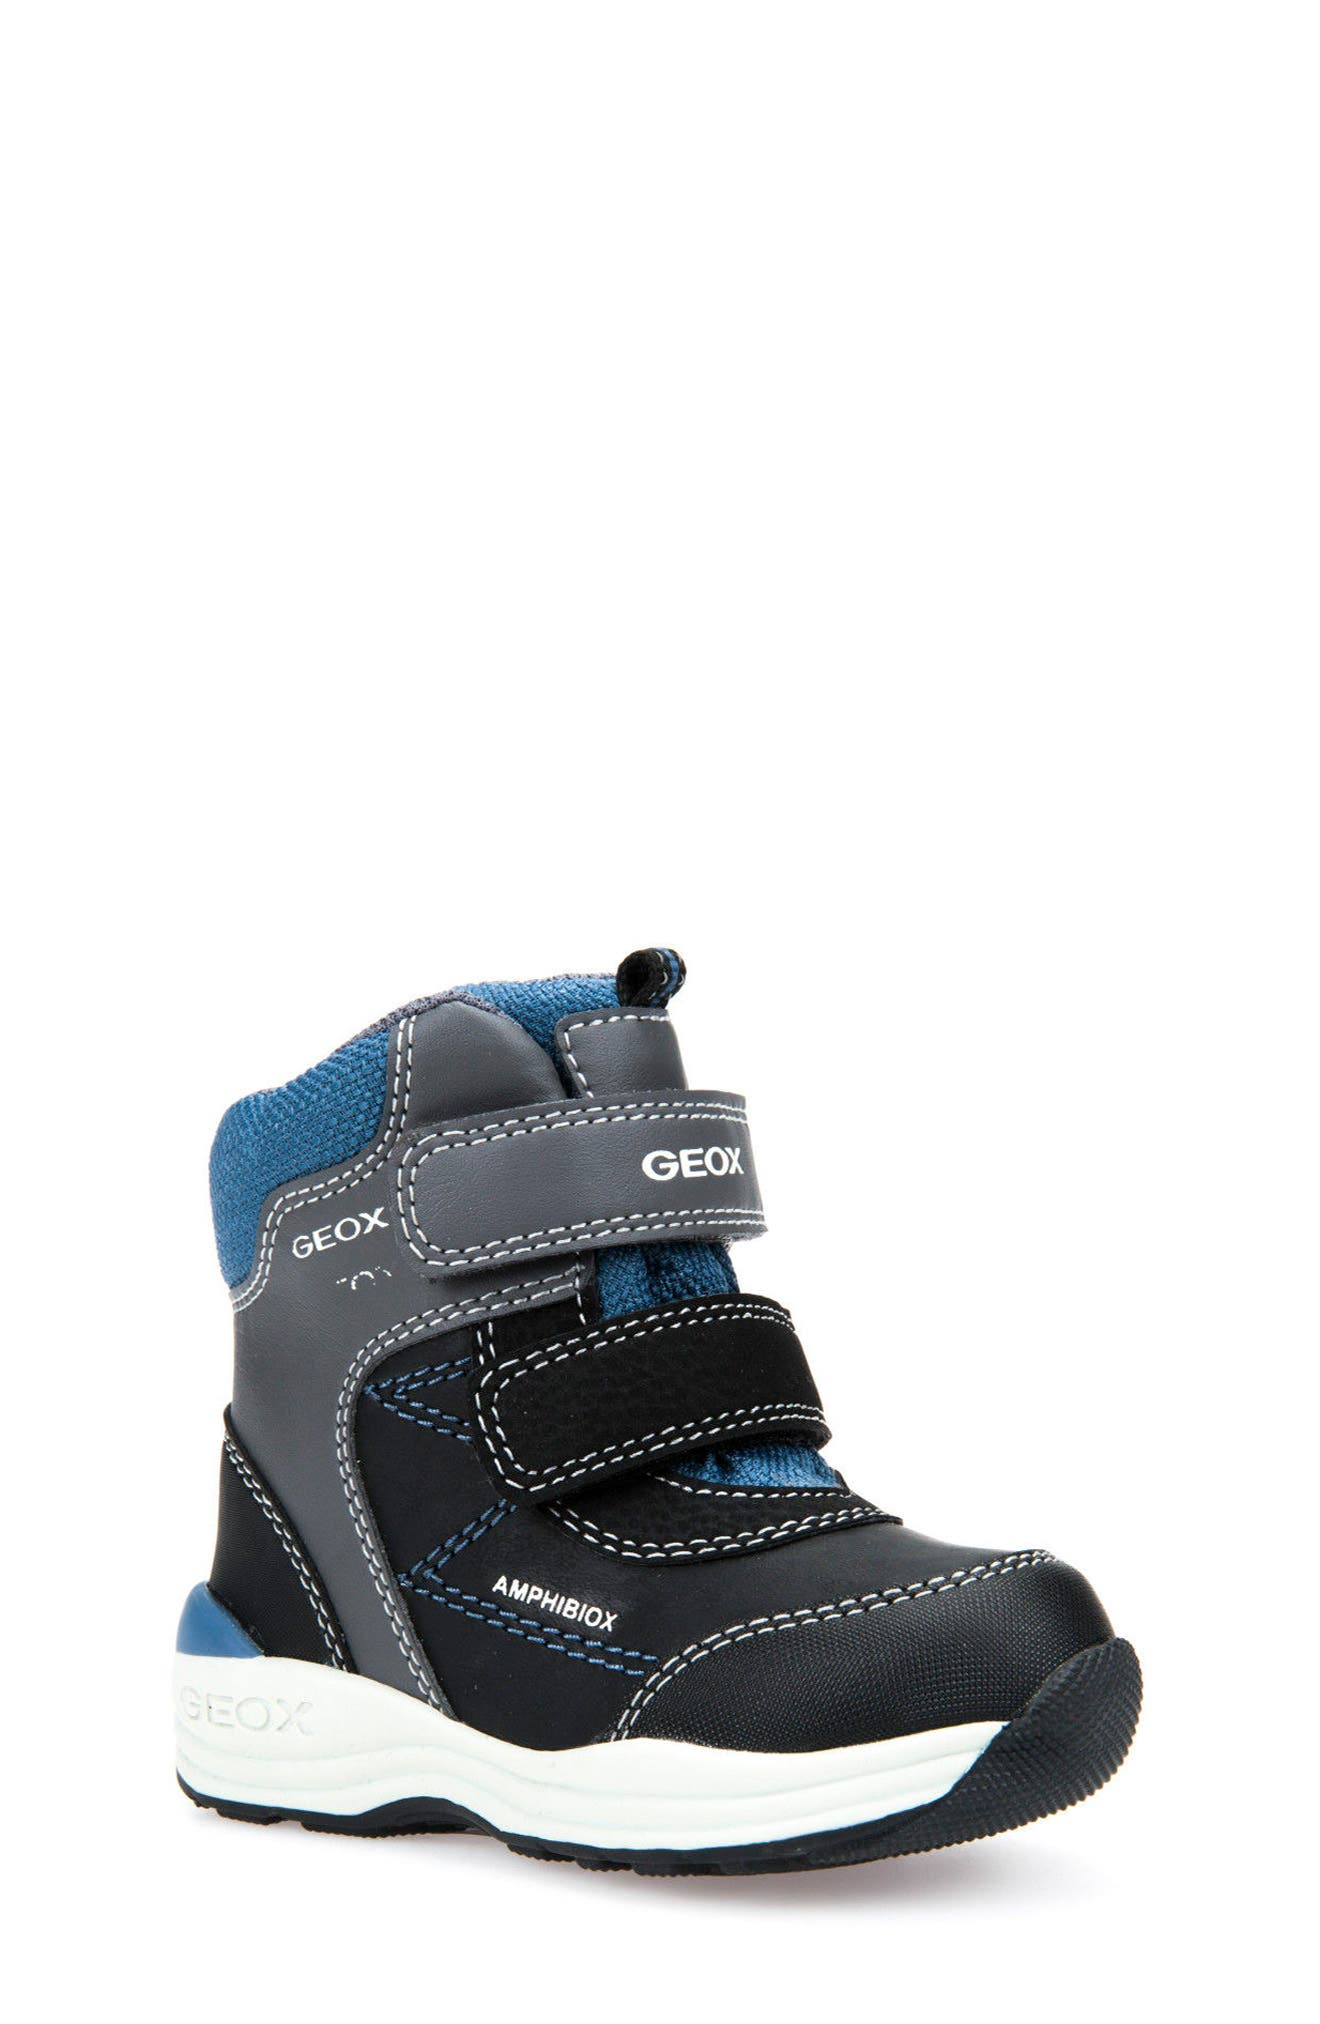 Gulp ABX Waterproof Boot,                         Main,                         color, 071